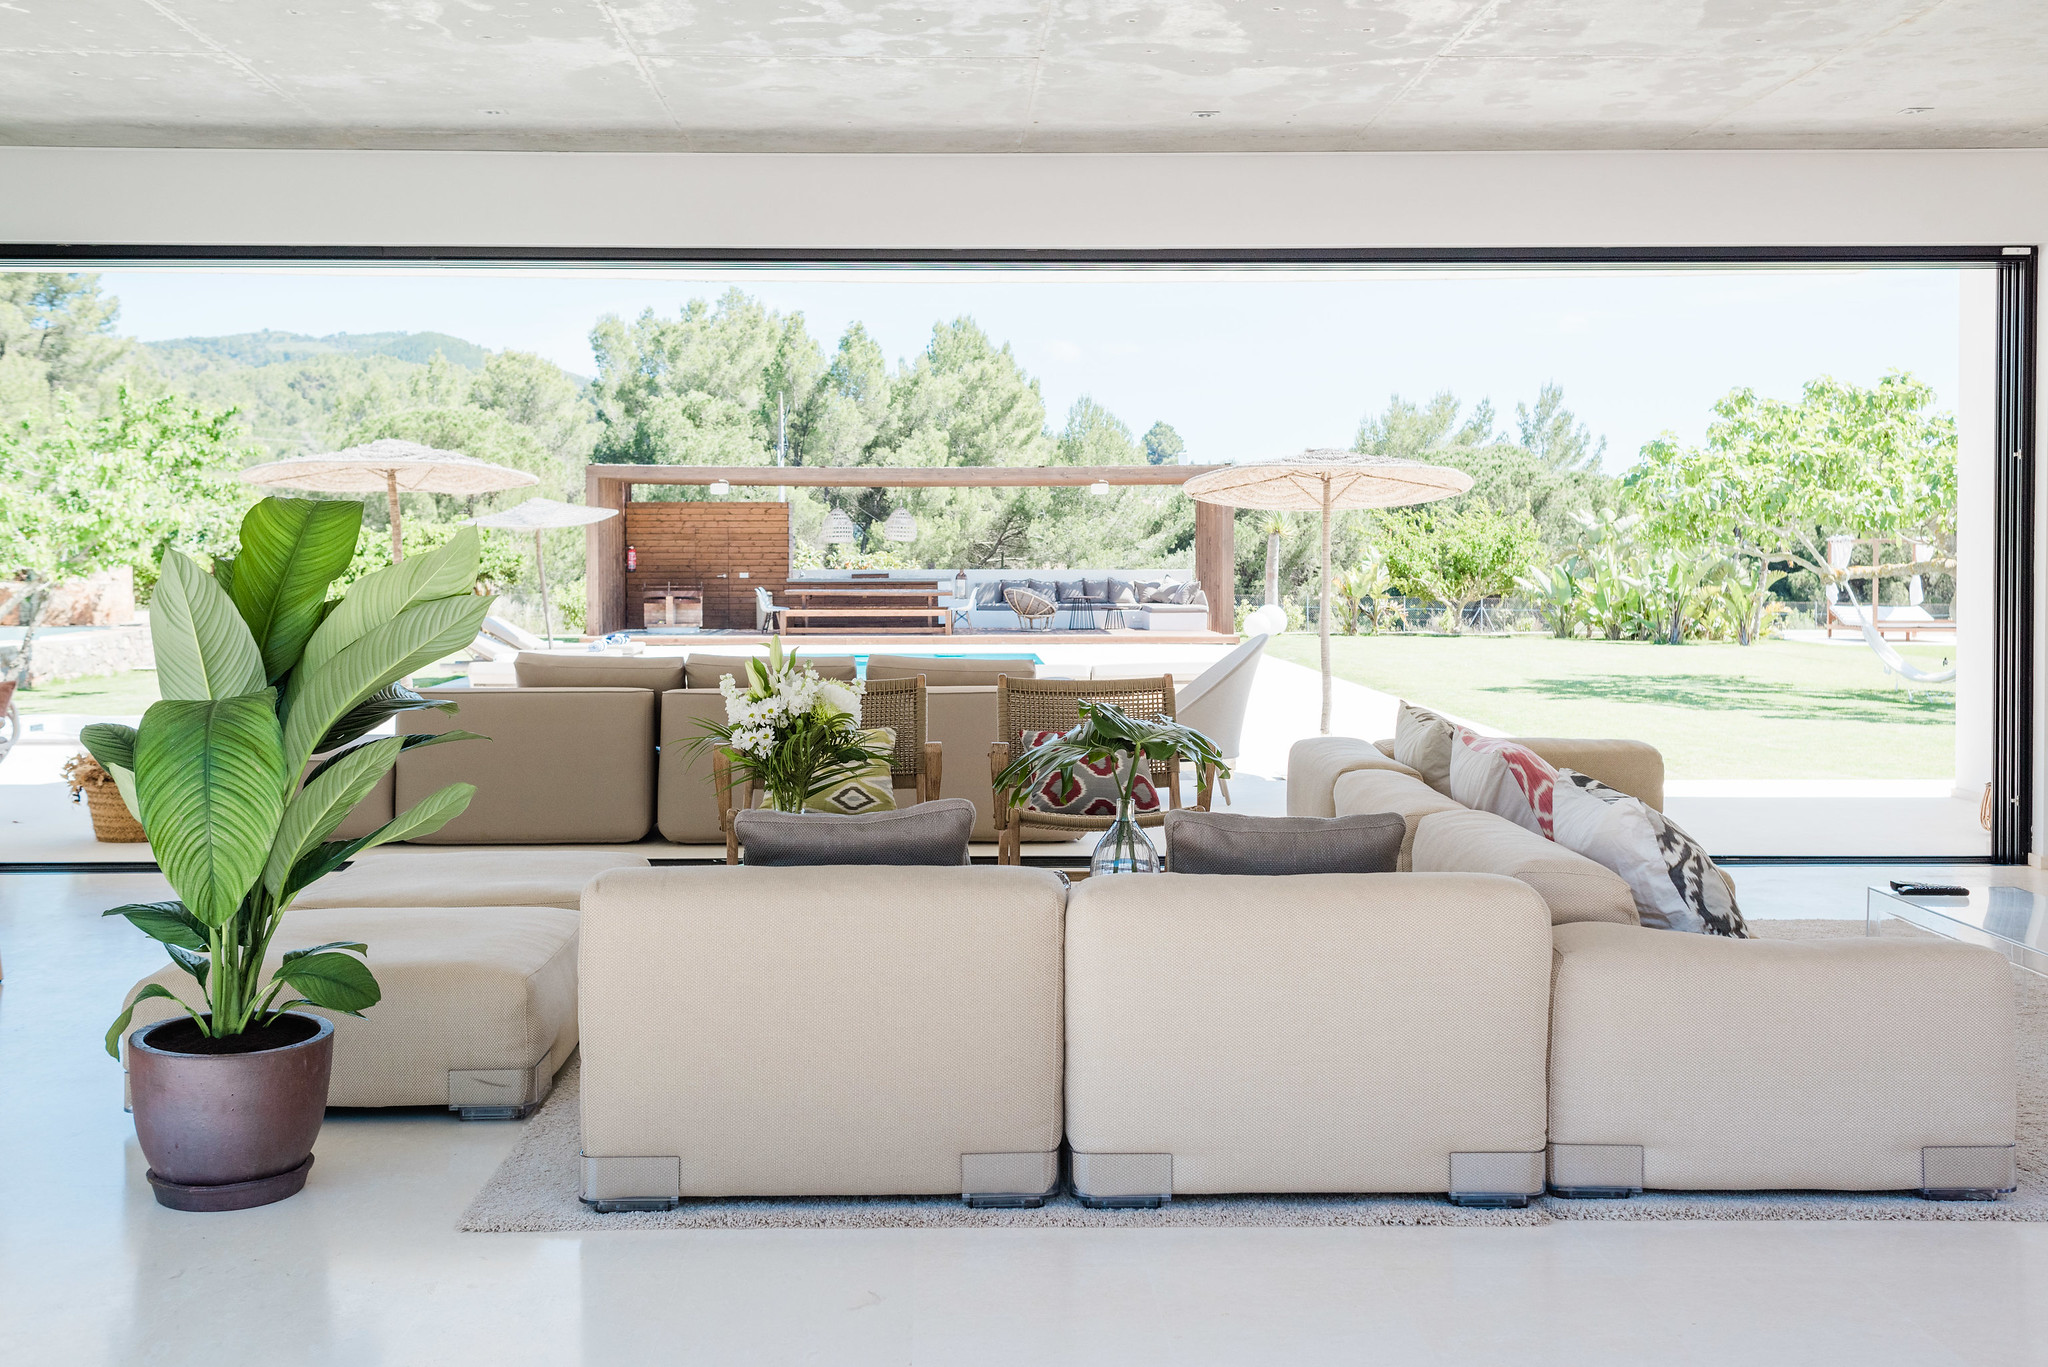 https://www.white-ibiza.com/wp-content/uploads/2020/06/white-ibiza-villas-can-carmen-interior-living-space-2.jpg